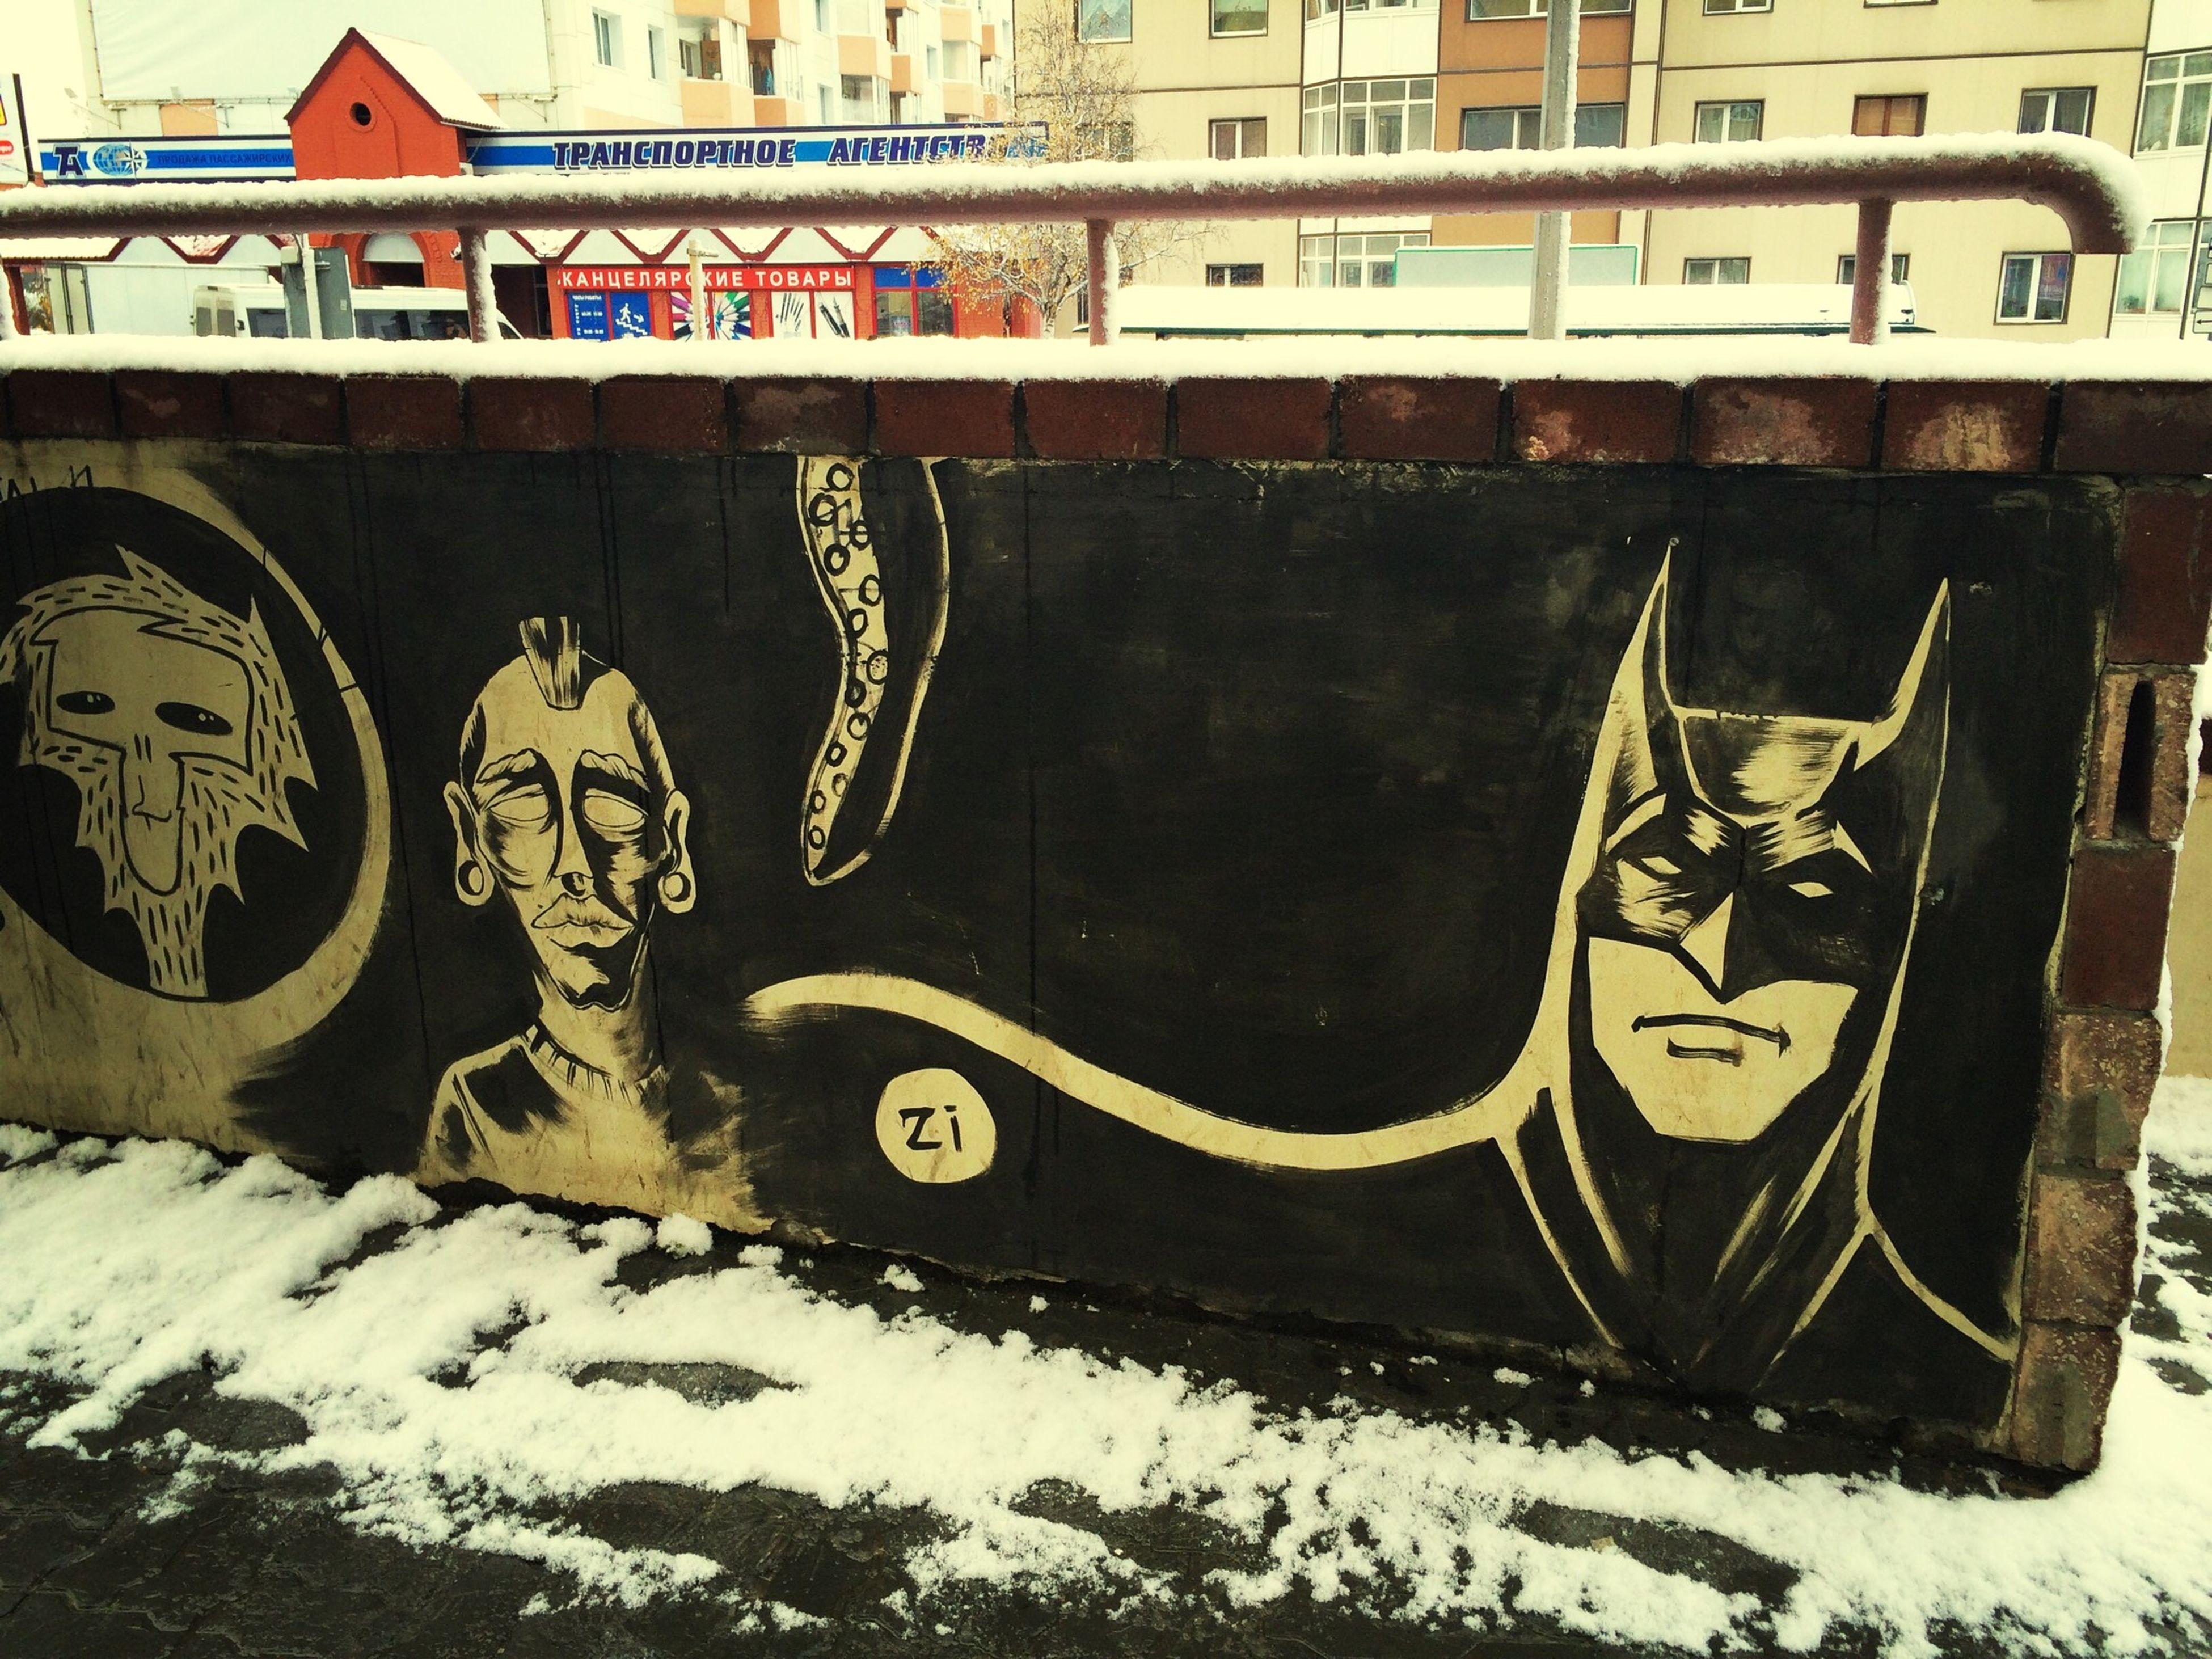 Streetphotography Graffiti ялюблюсвойгород Batman